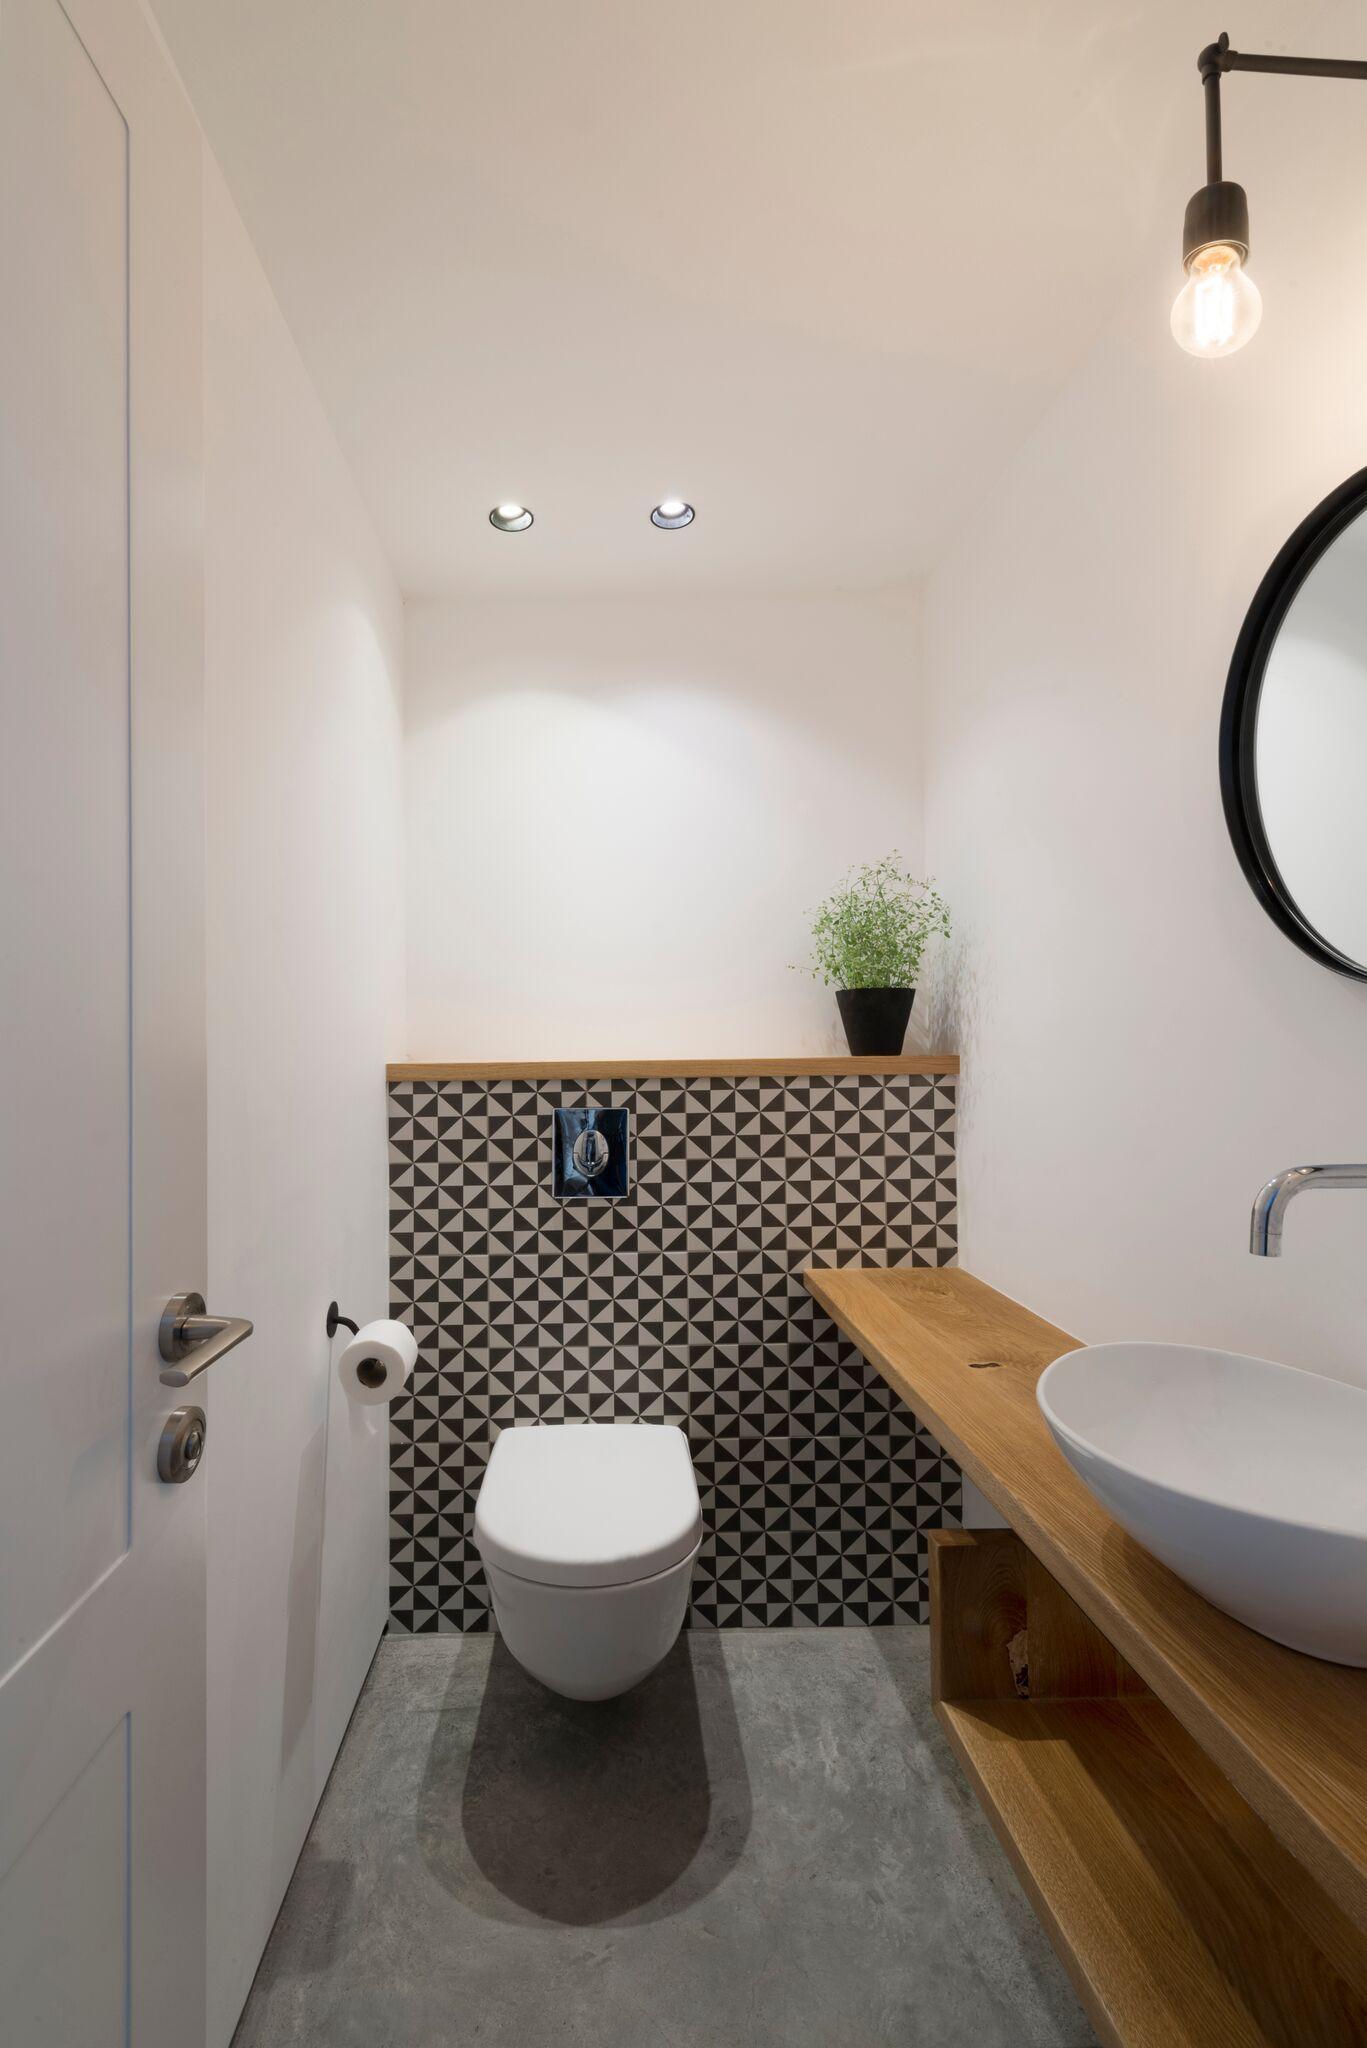 Toilet Room Small Bathroom Inspiration Small Bathroom Small Toilet Design